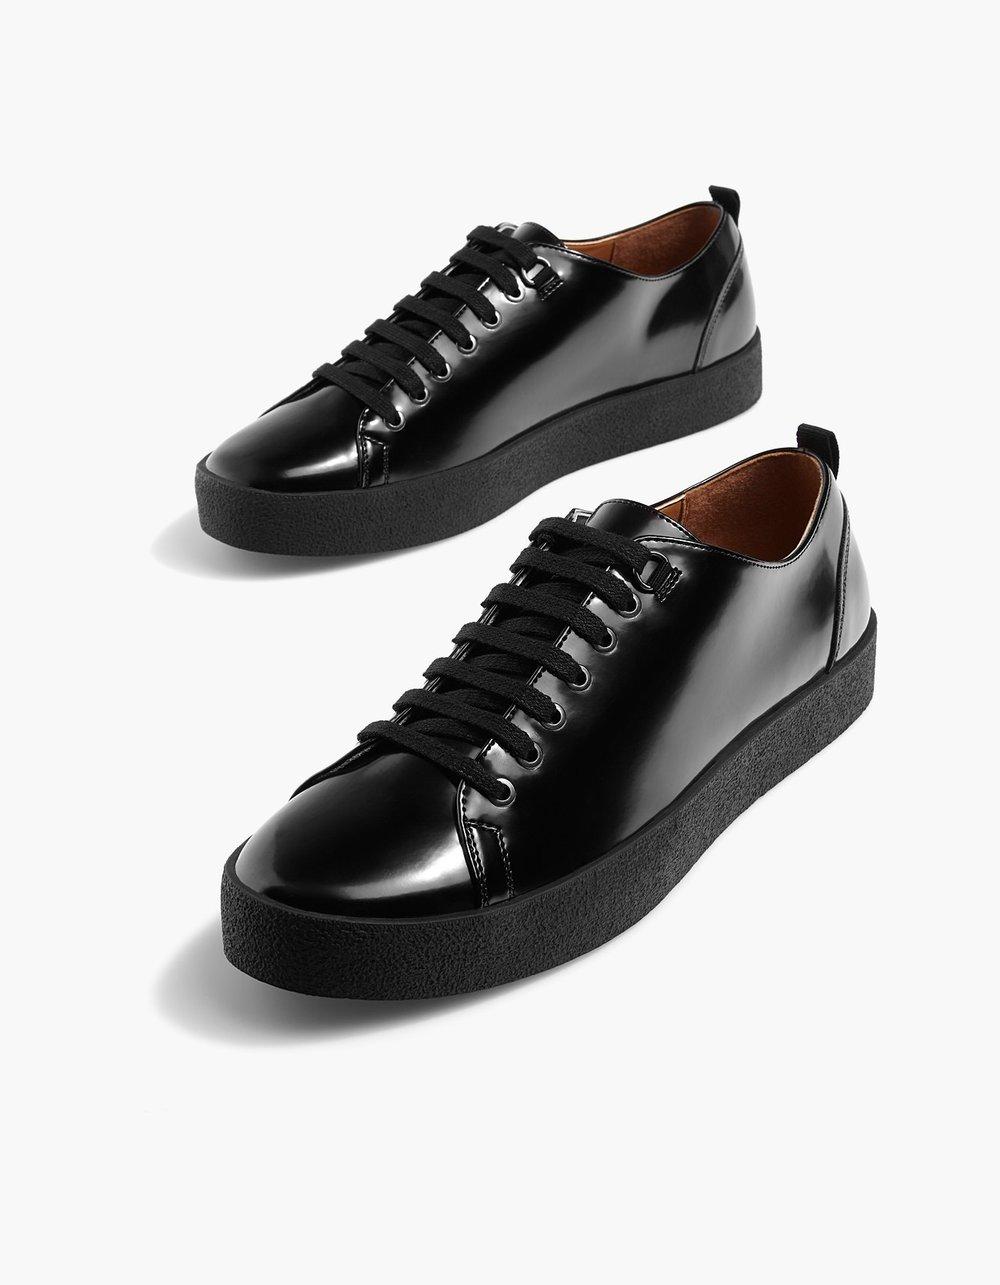 Black Sneakers, £29.99 ( Stradivarius )